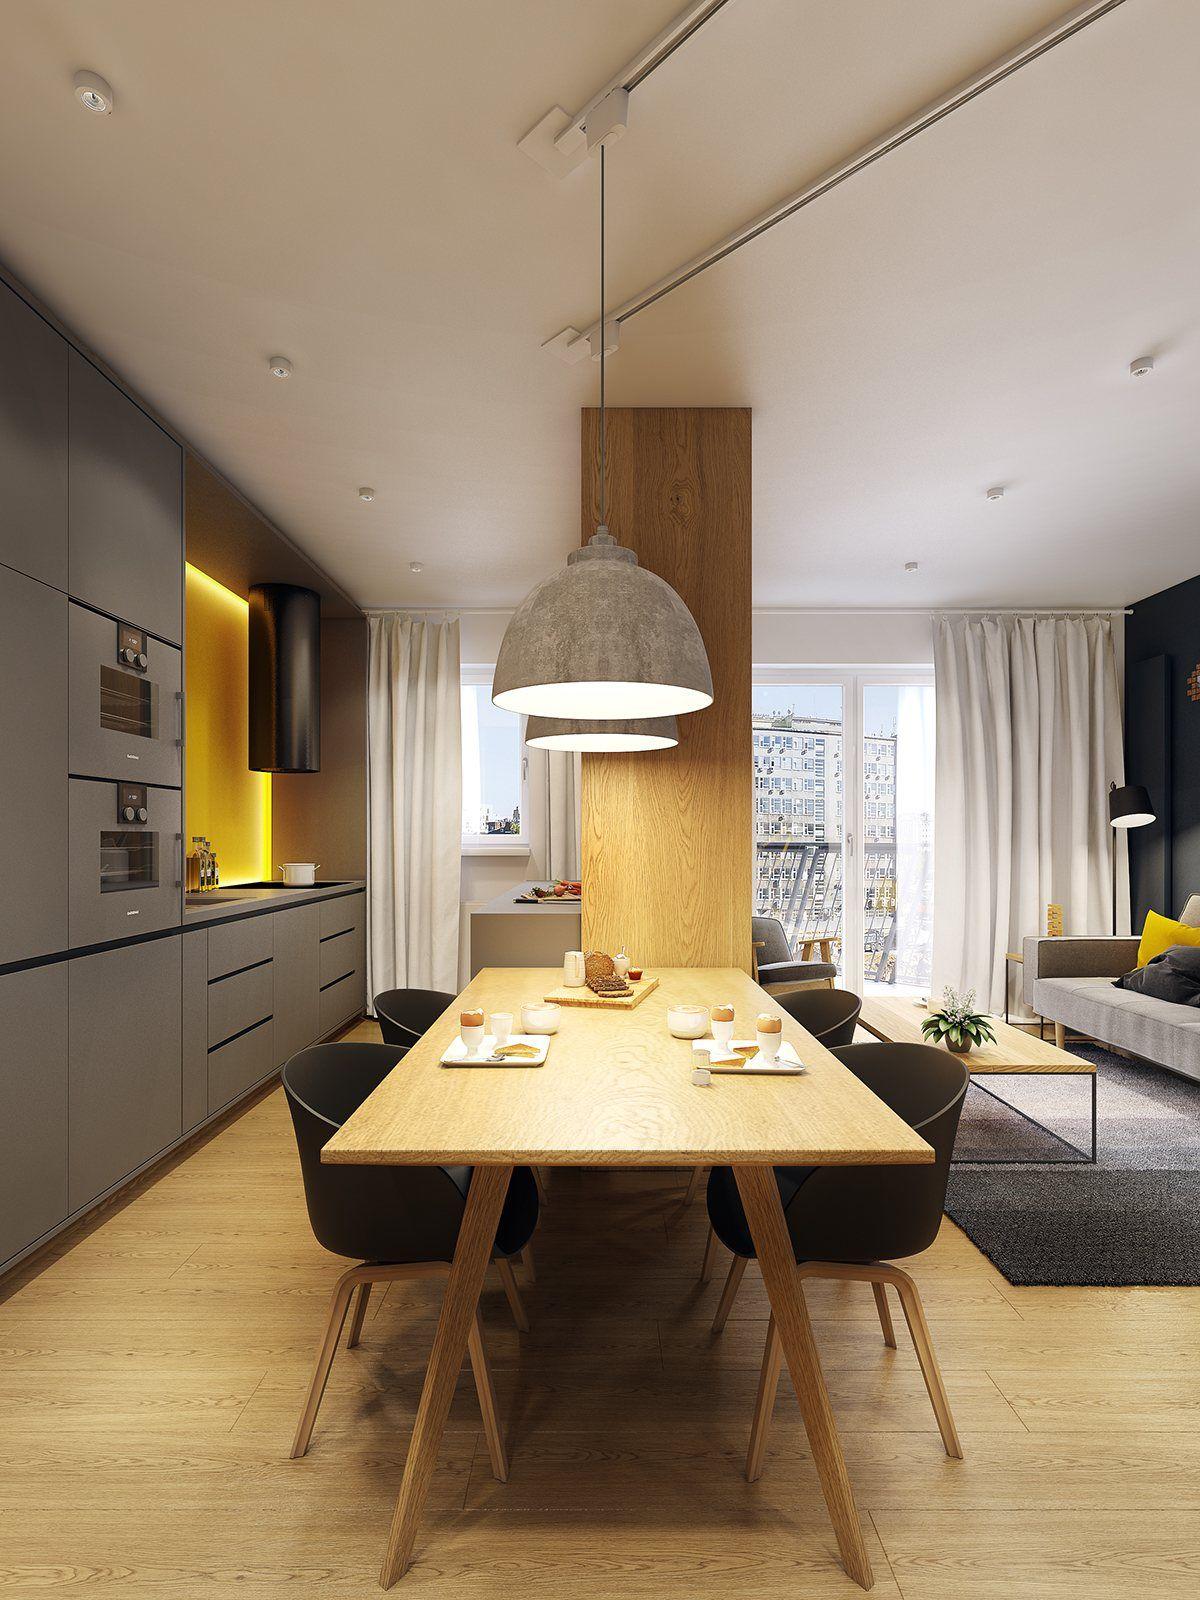 Appartement moderne scandinave ing nieux for the home - Idee amenagement cuisine ouverte sur salon ...